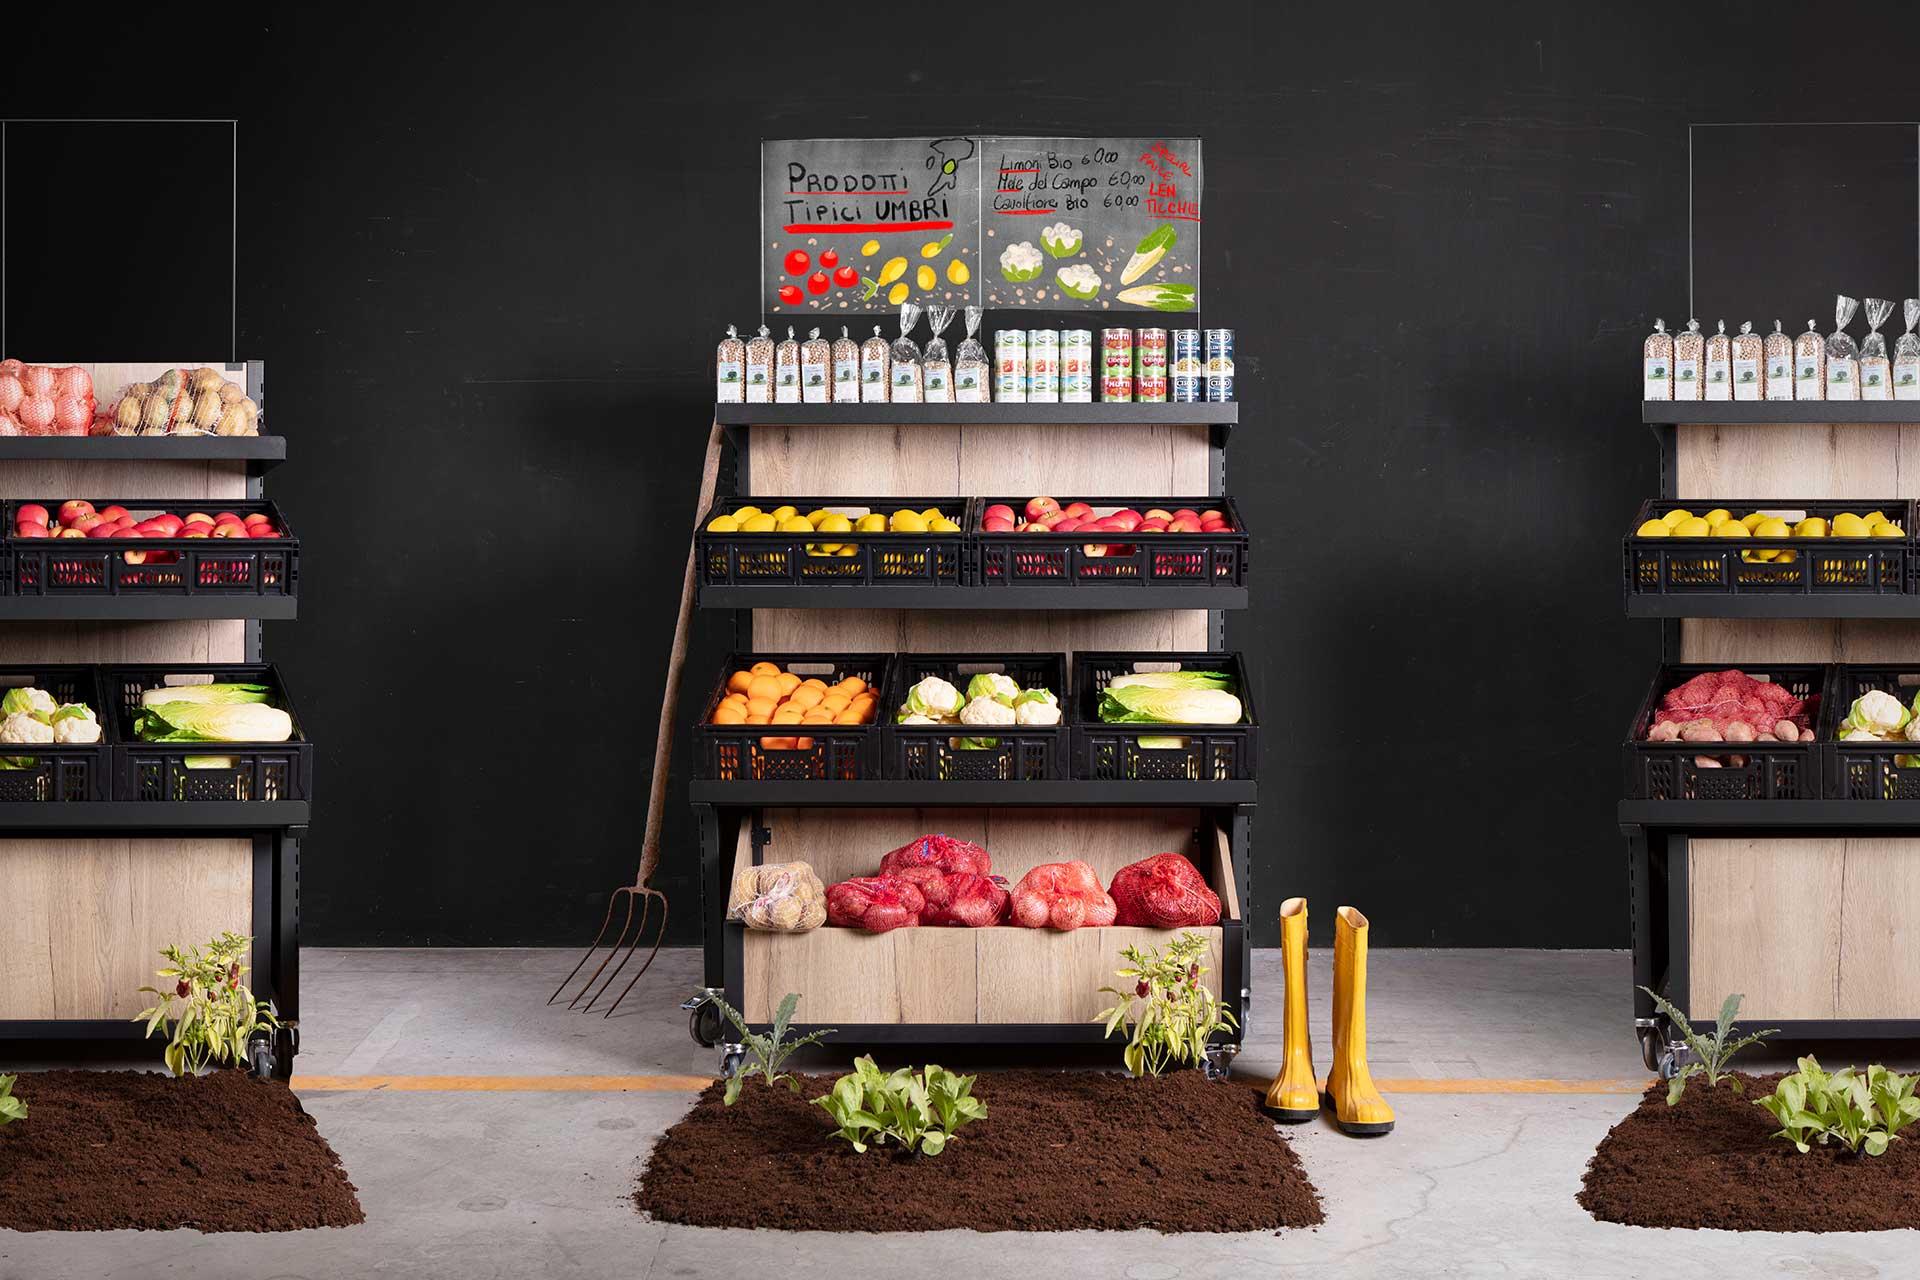 FRUIT AND VEGETABLE DEPARTEMENT